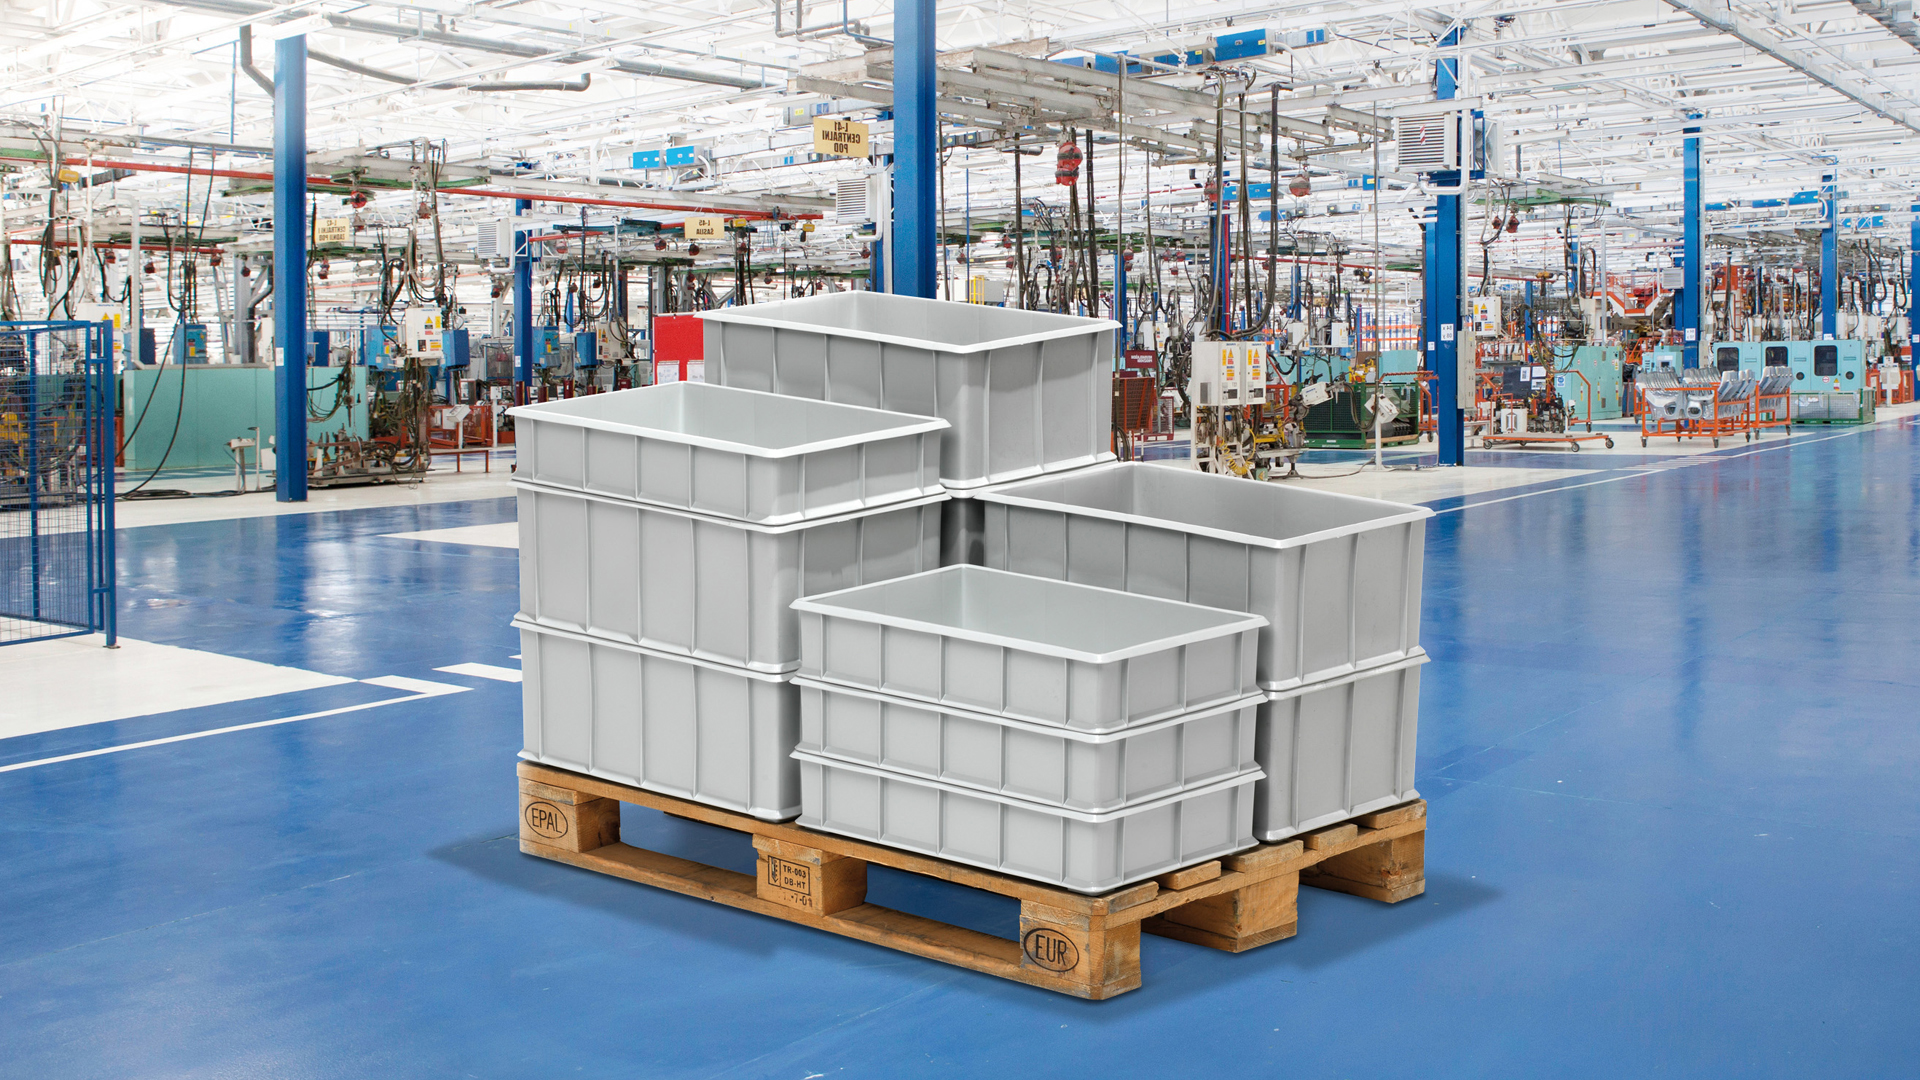 Lagersysteme-Transportbehalter-Europalette-mt-mauser-16-9TP3NfjyCEjOJR